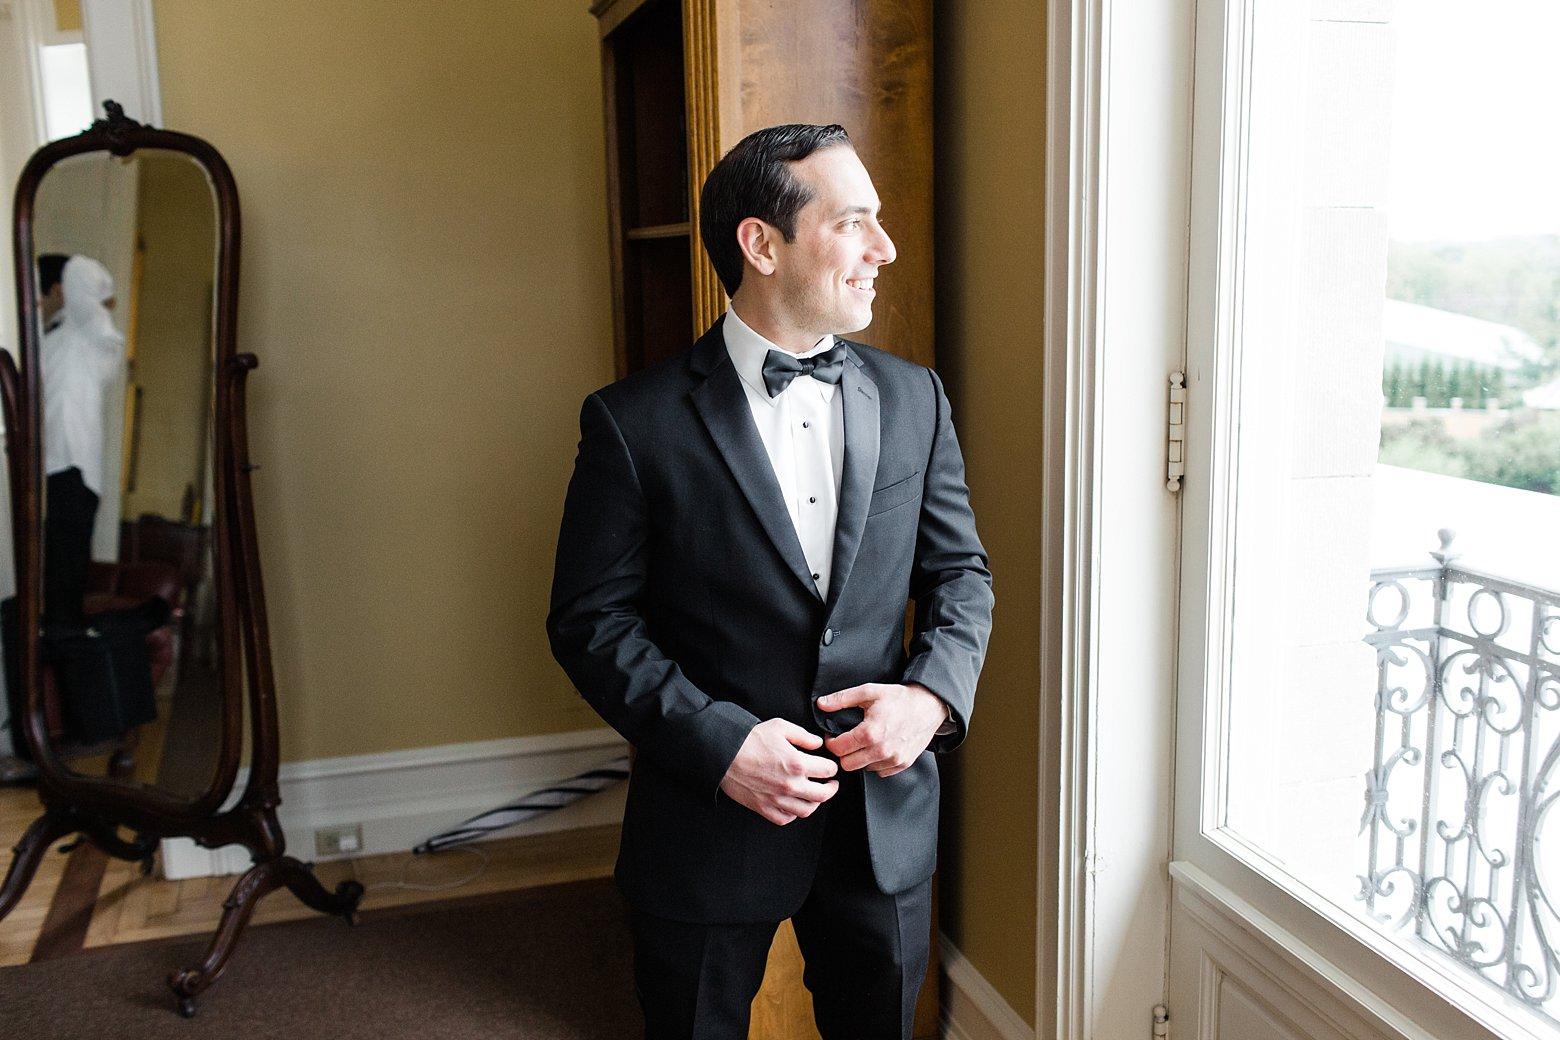 lauren_fair_photography_april_lynn_designs_stasia_matt_spring_cairnwood_estate_wedding_northeast_philadelphia_blush_pink_gold_wedding_invitation_stationery_0017